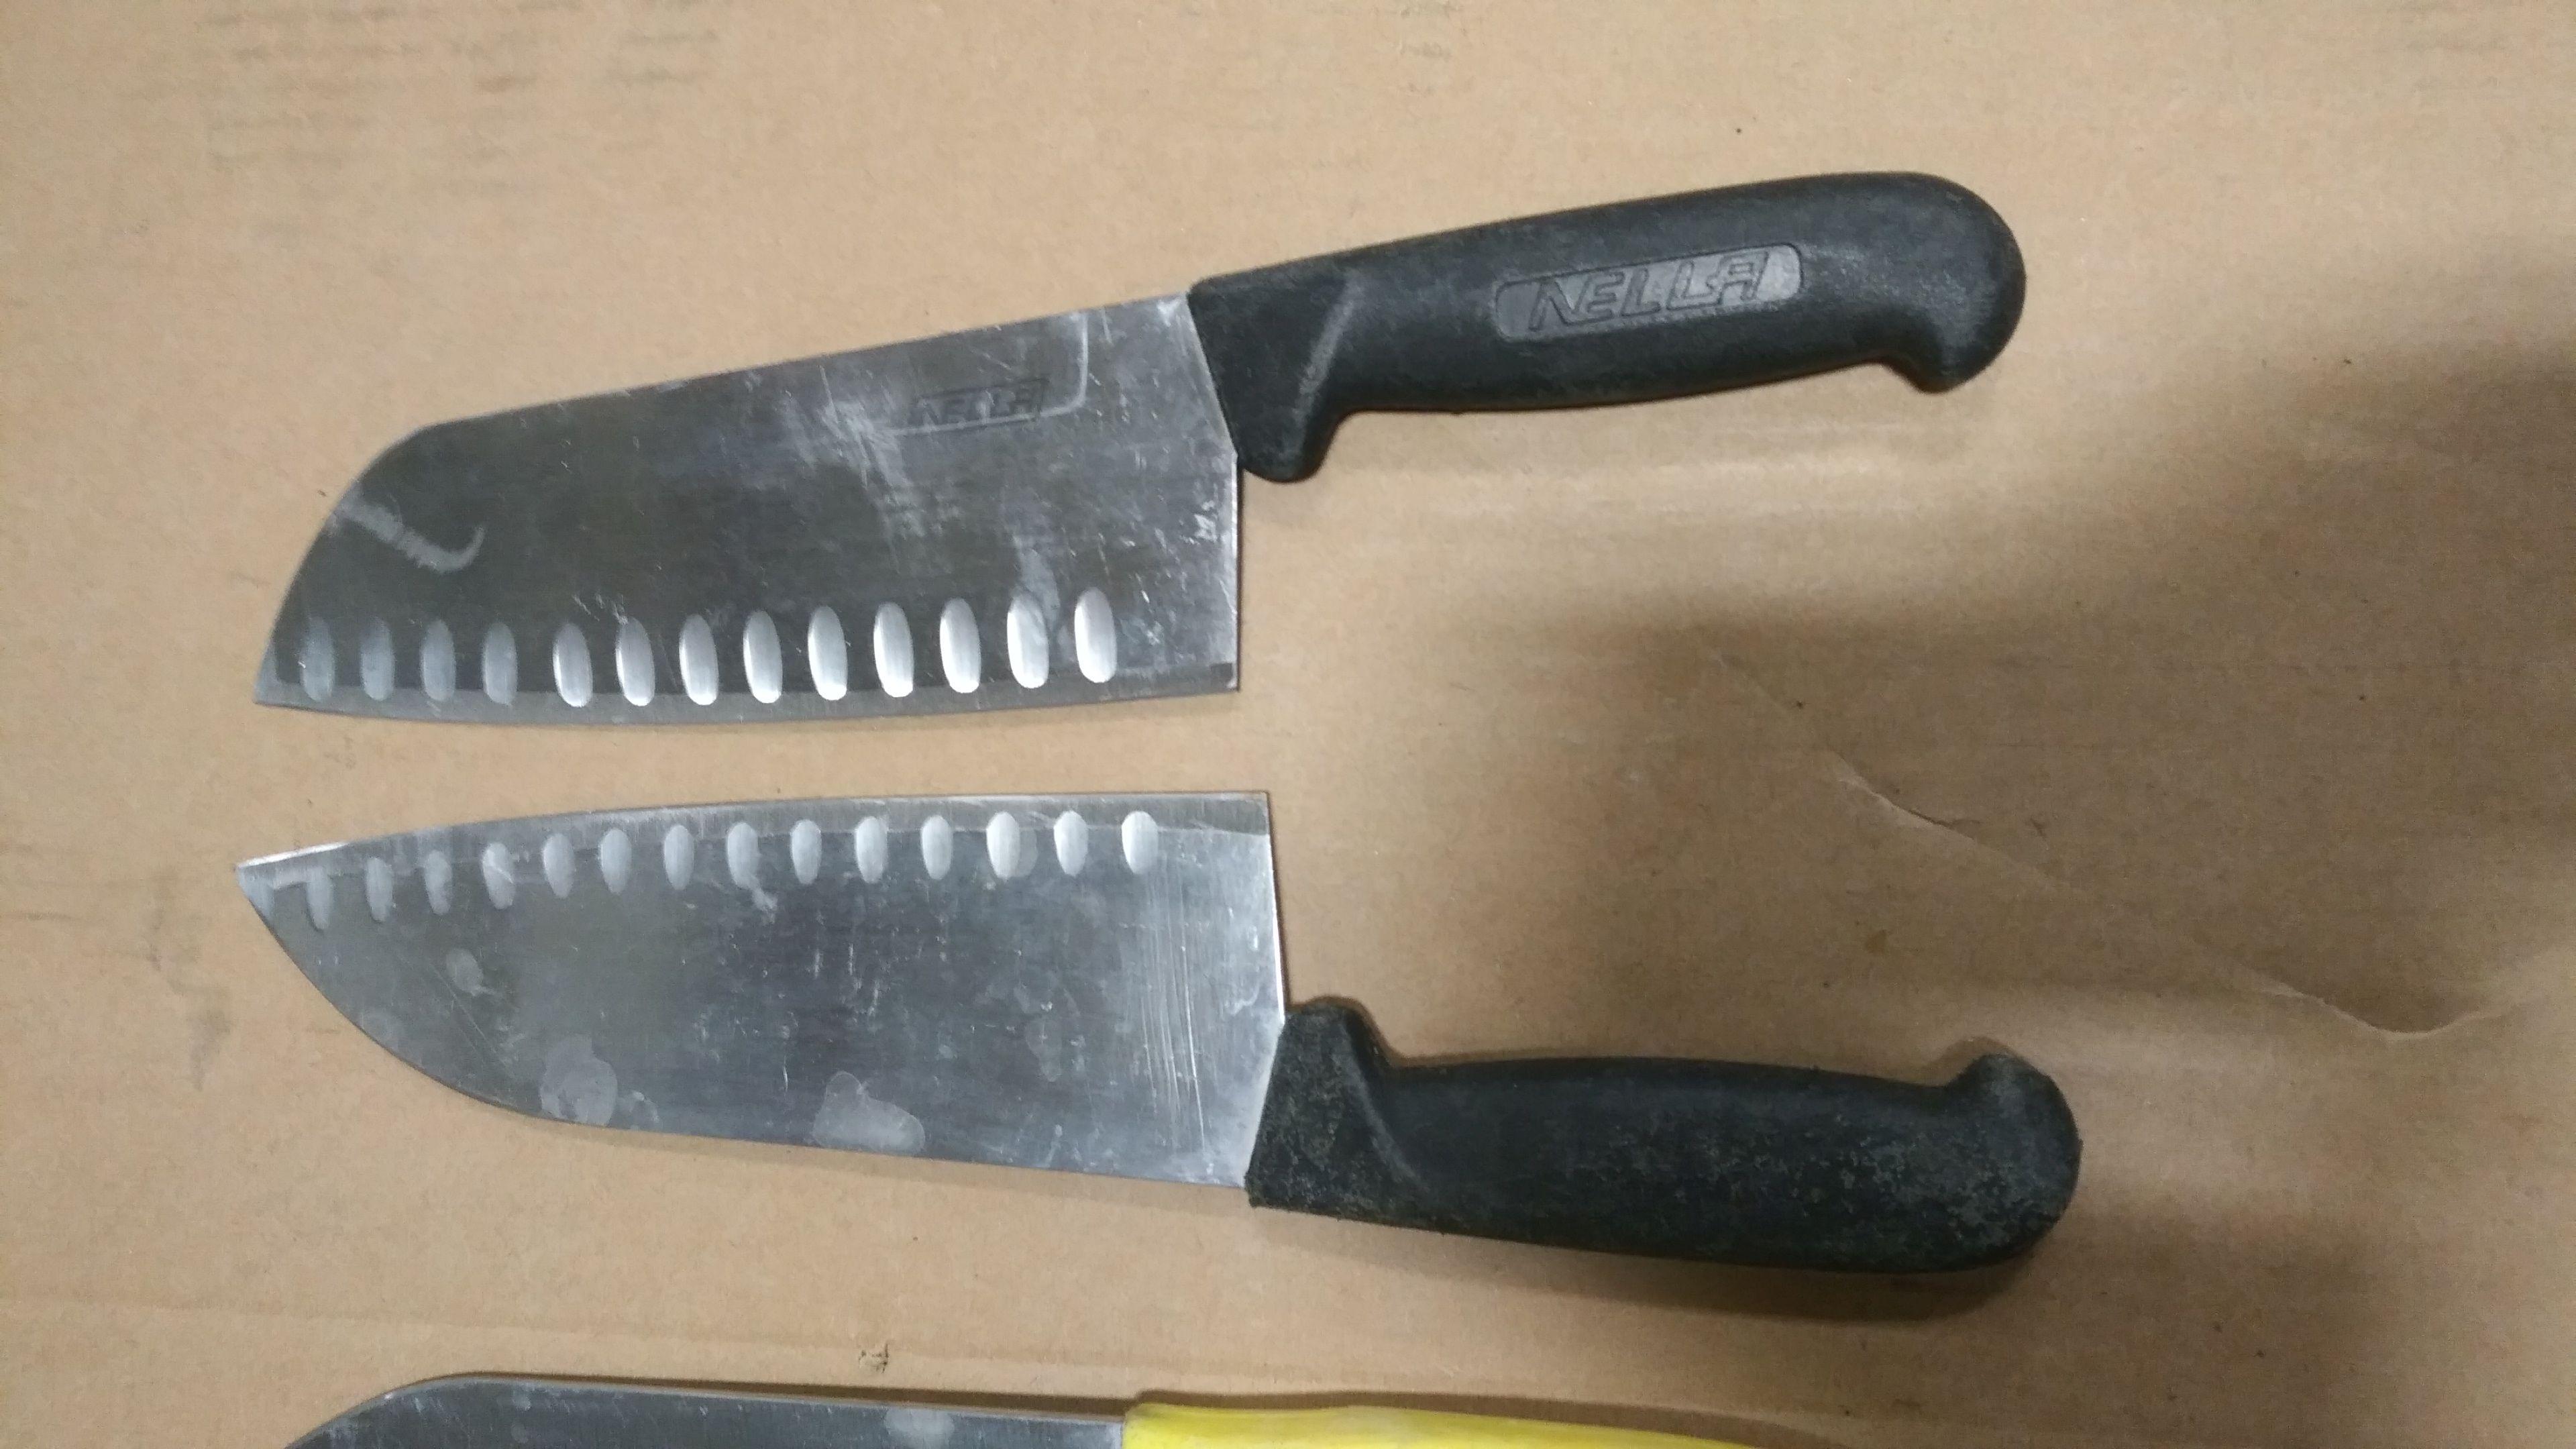 Lot 22 - Used/Sharpened Black Santoku Knives - lot of 2